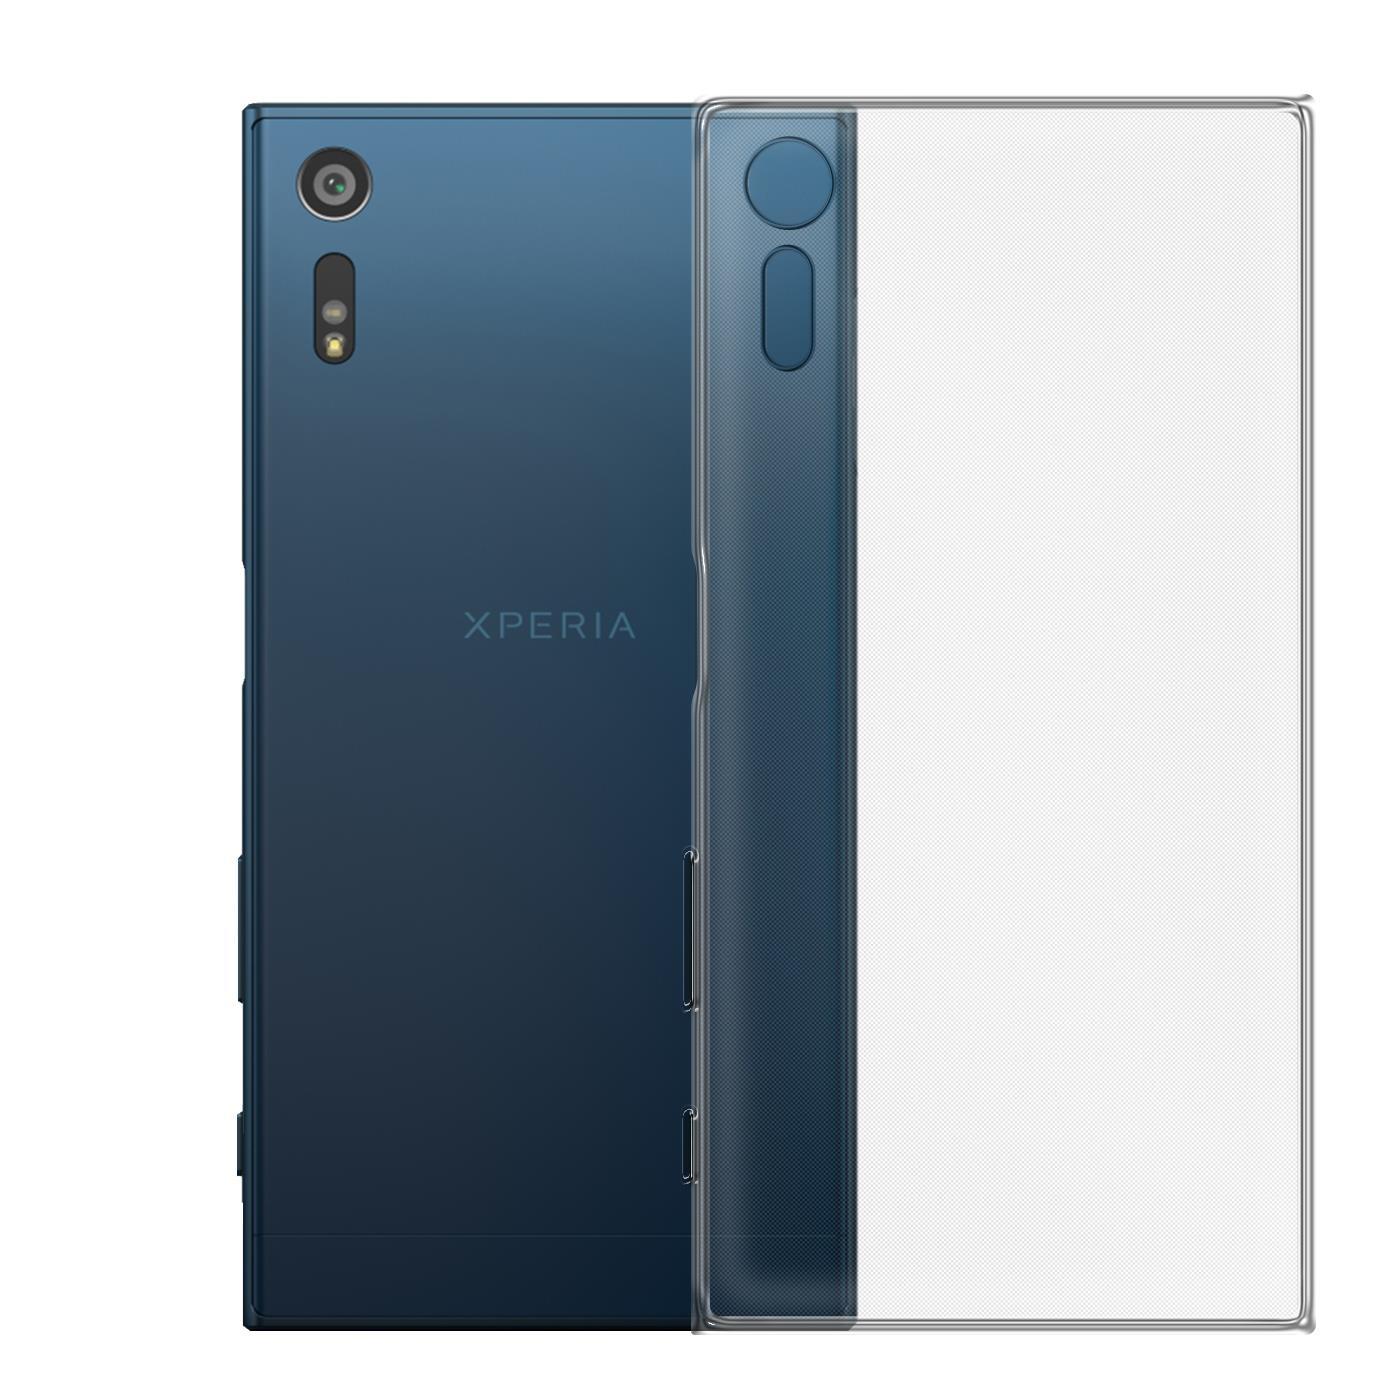 Sony-Xperia-XZ-Thin-Silikon-Klar-Case-Cover-Ultra-Slim-Stossfeste-Gel-Rueckseite Indexbild 4